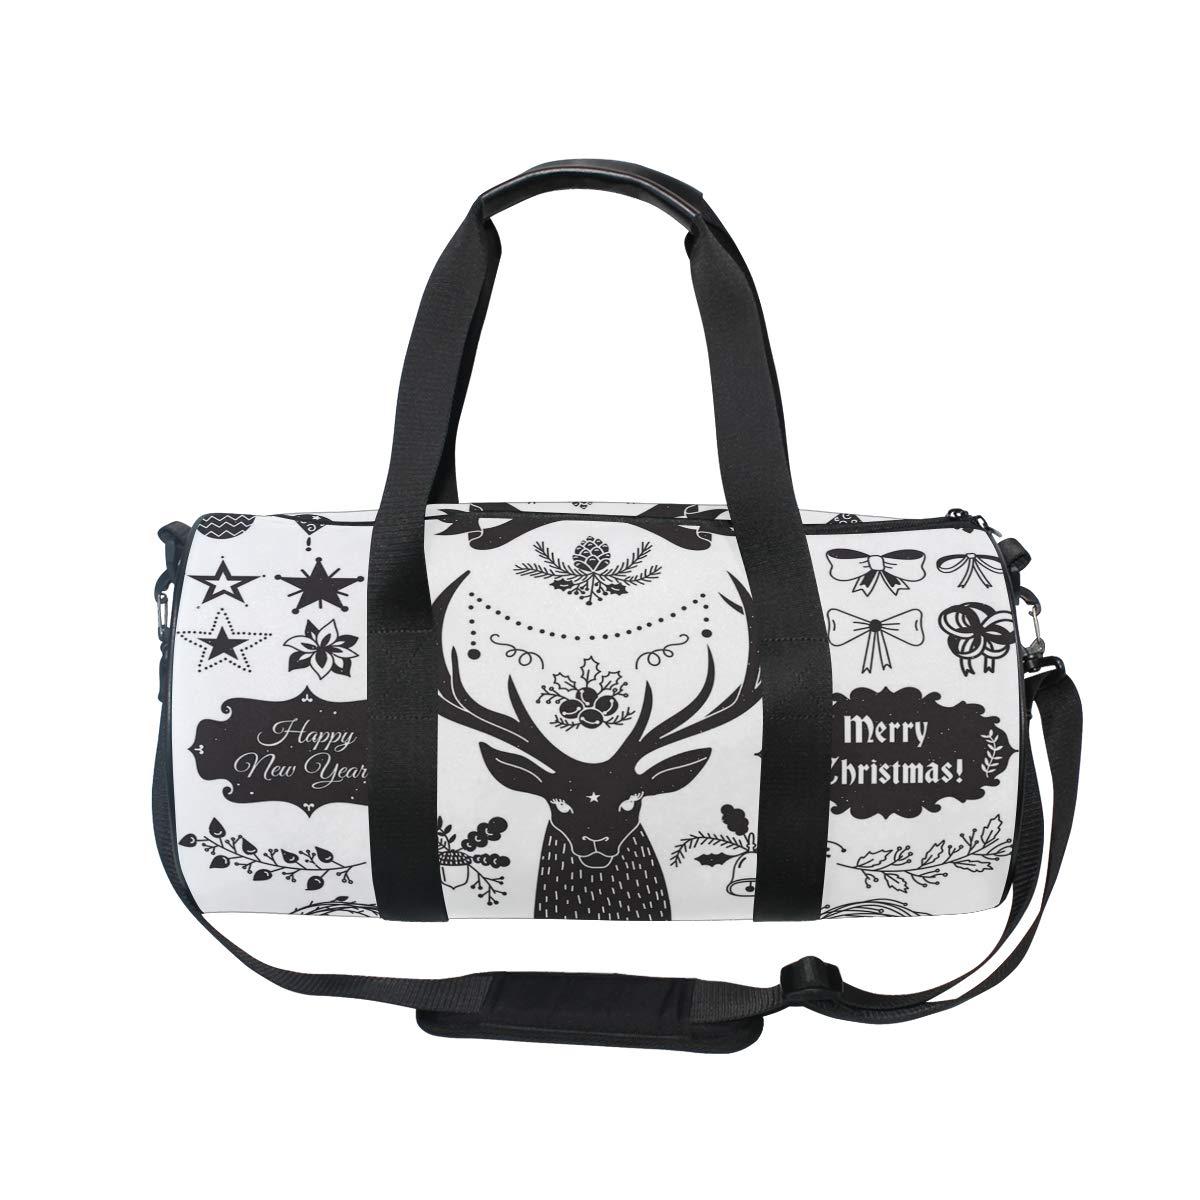 Cute Moose Christmas Decorations Popular casual fitness bag,Non-Slip Wearable Crossbody Bag Waterproof Shoulder Bag.